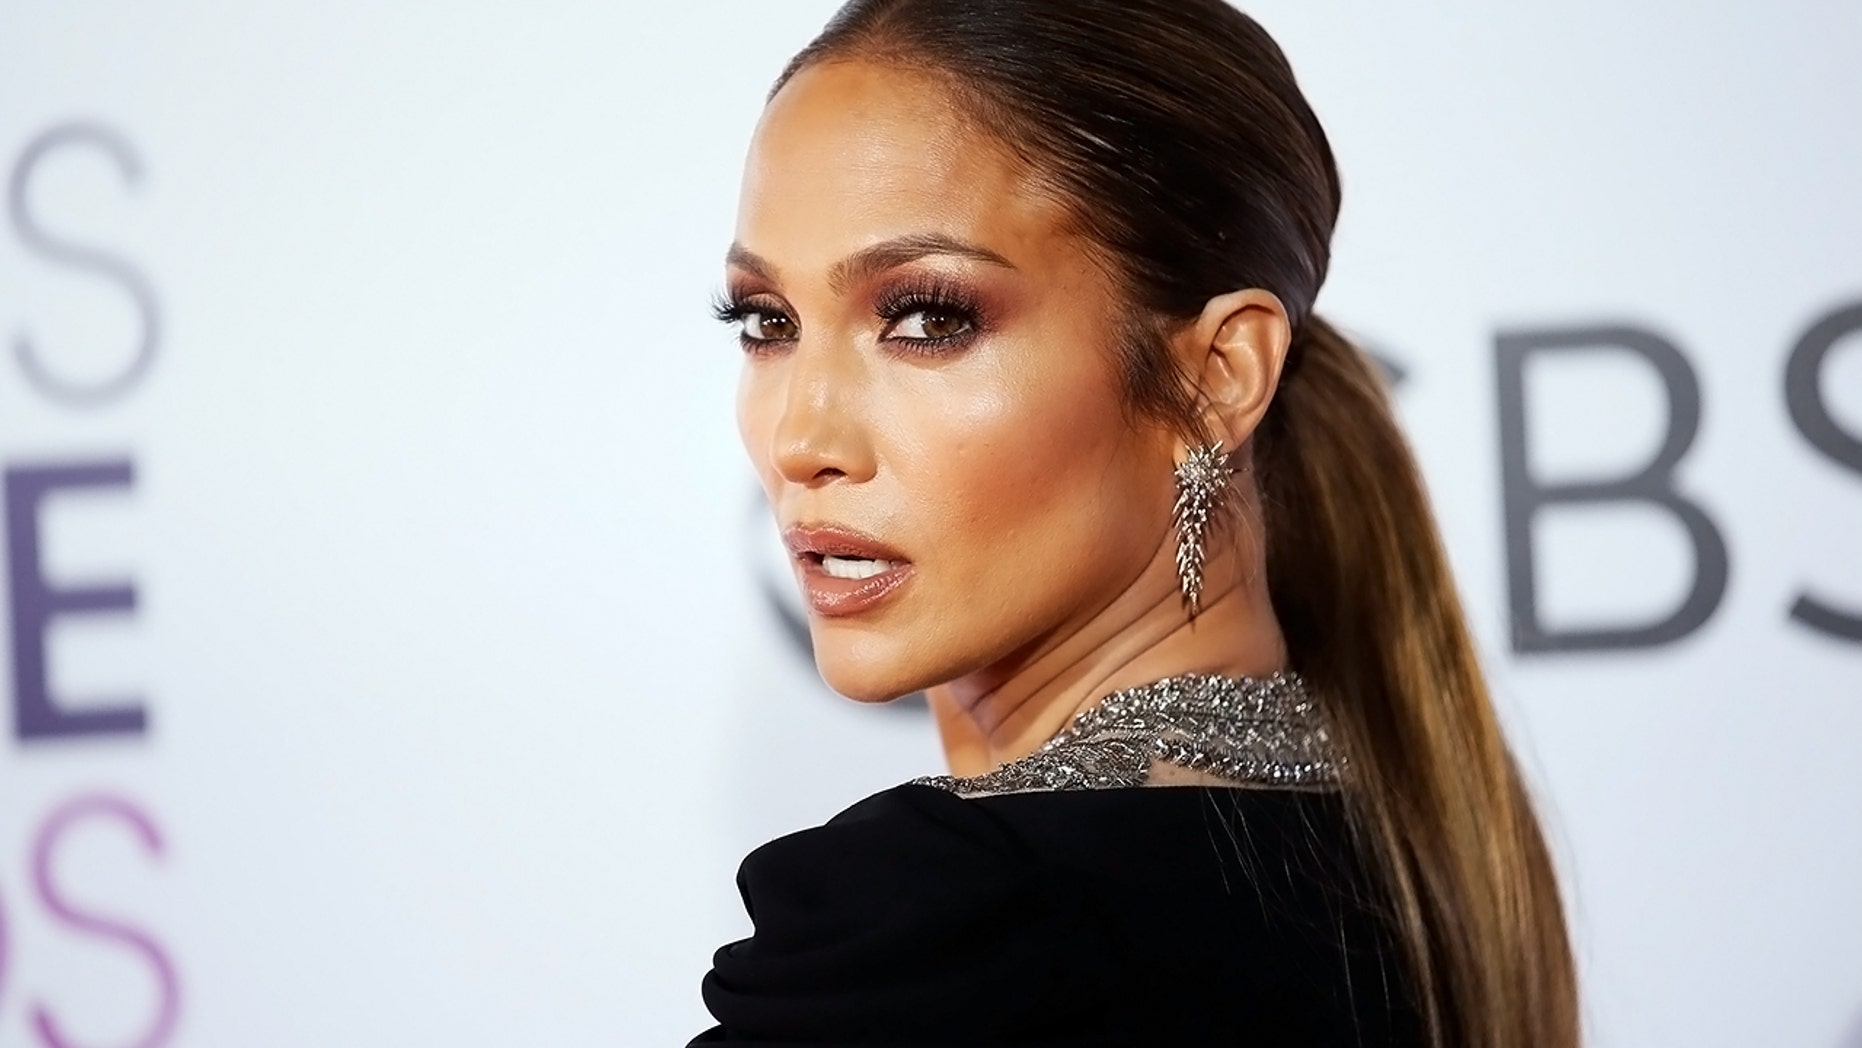 Jennifer Lopez Postpones Las Vegas Shows Following Deadly Shooting